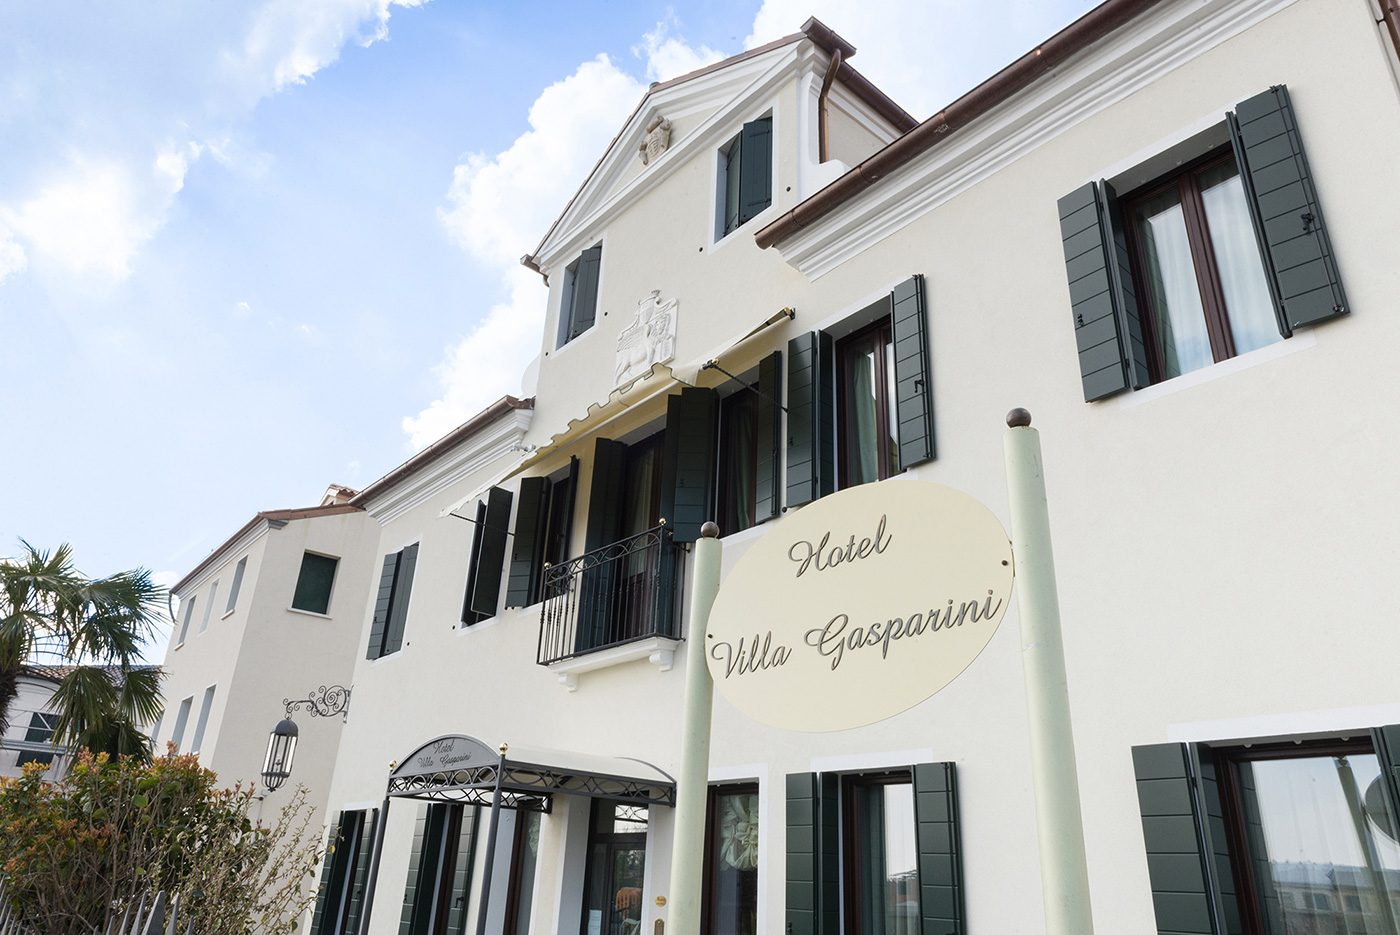 Servizio navetta shuttle hotel Venezia riviera del Brenta